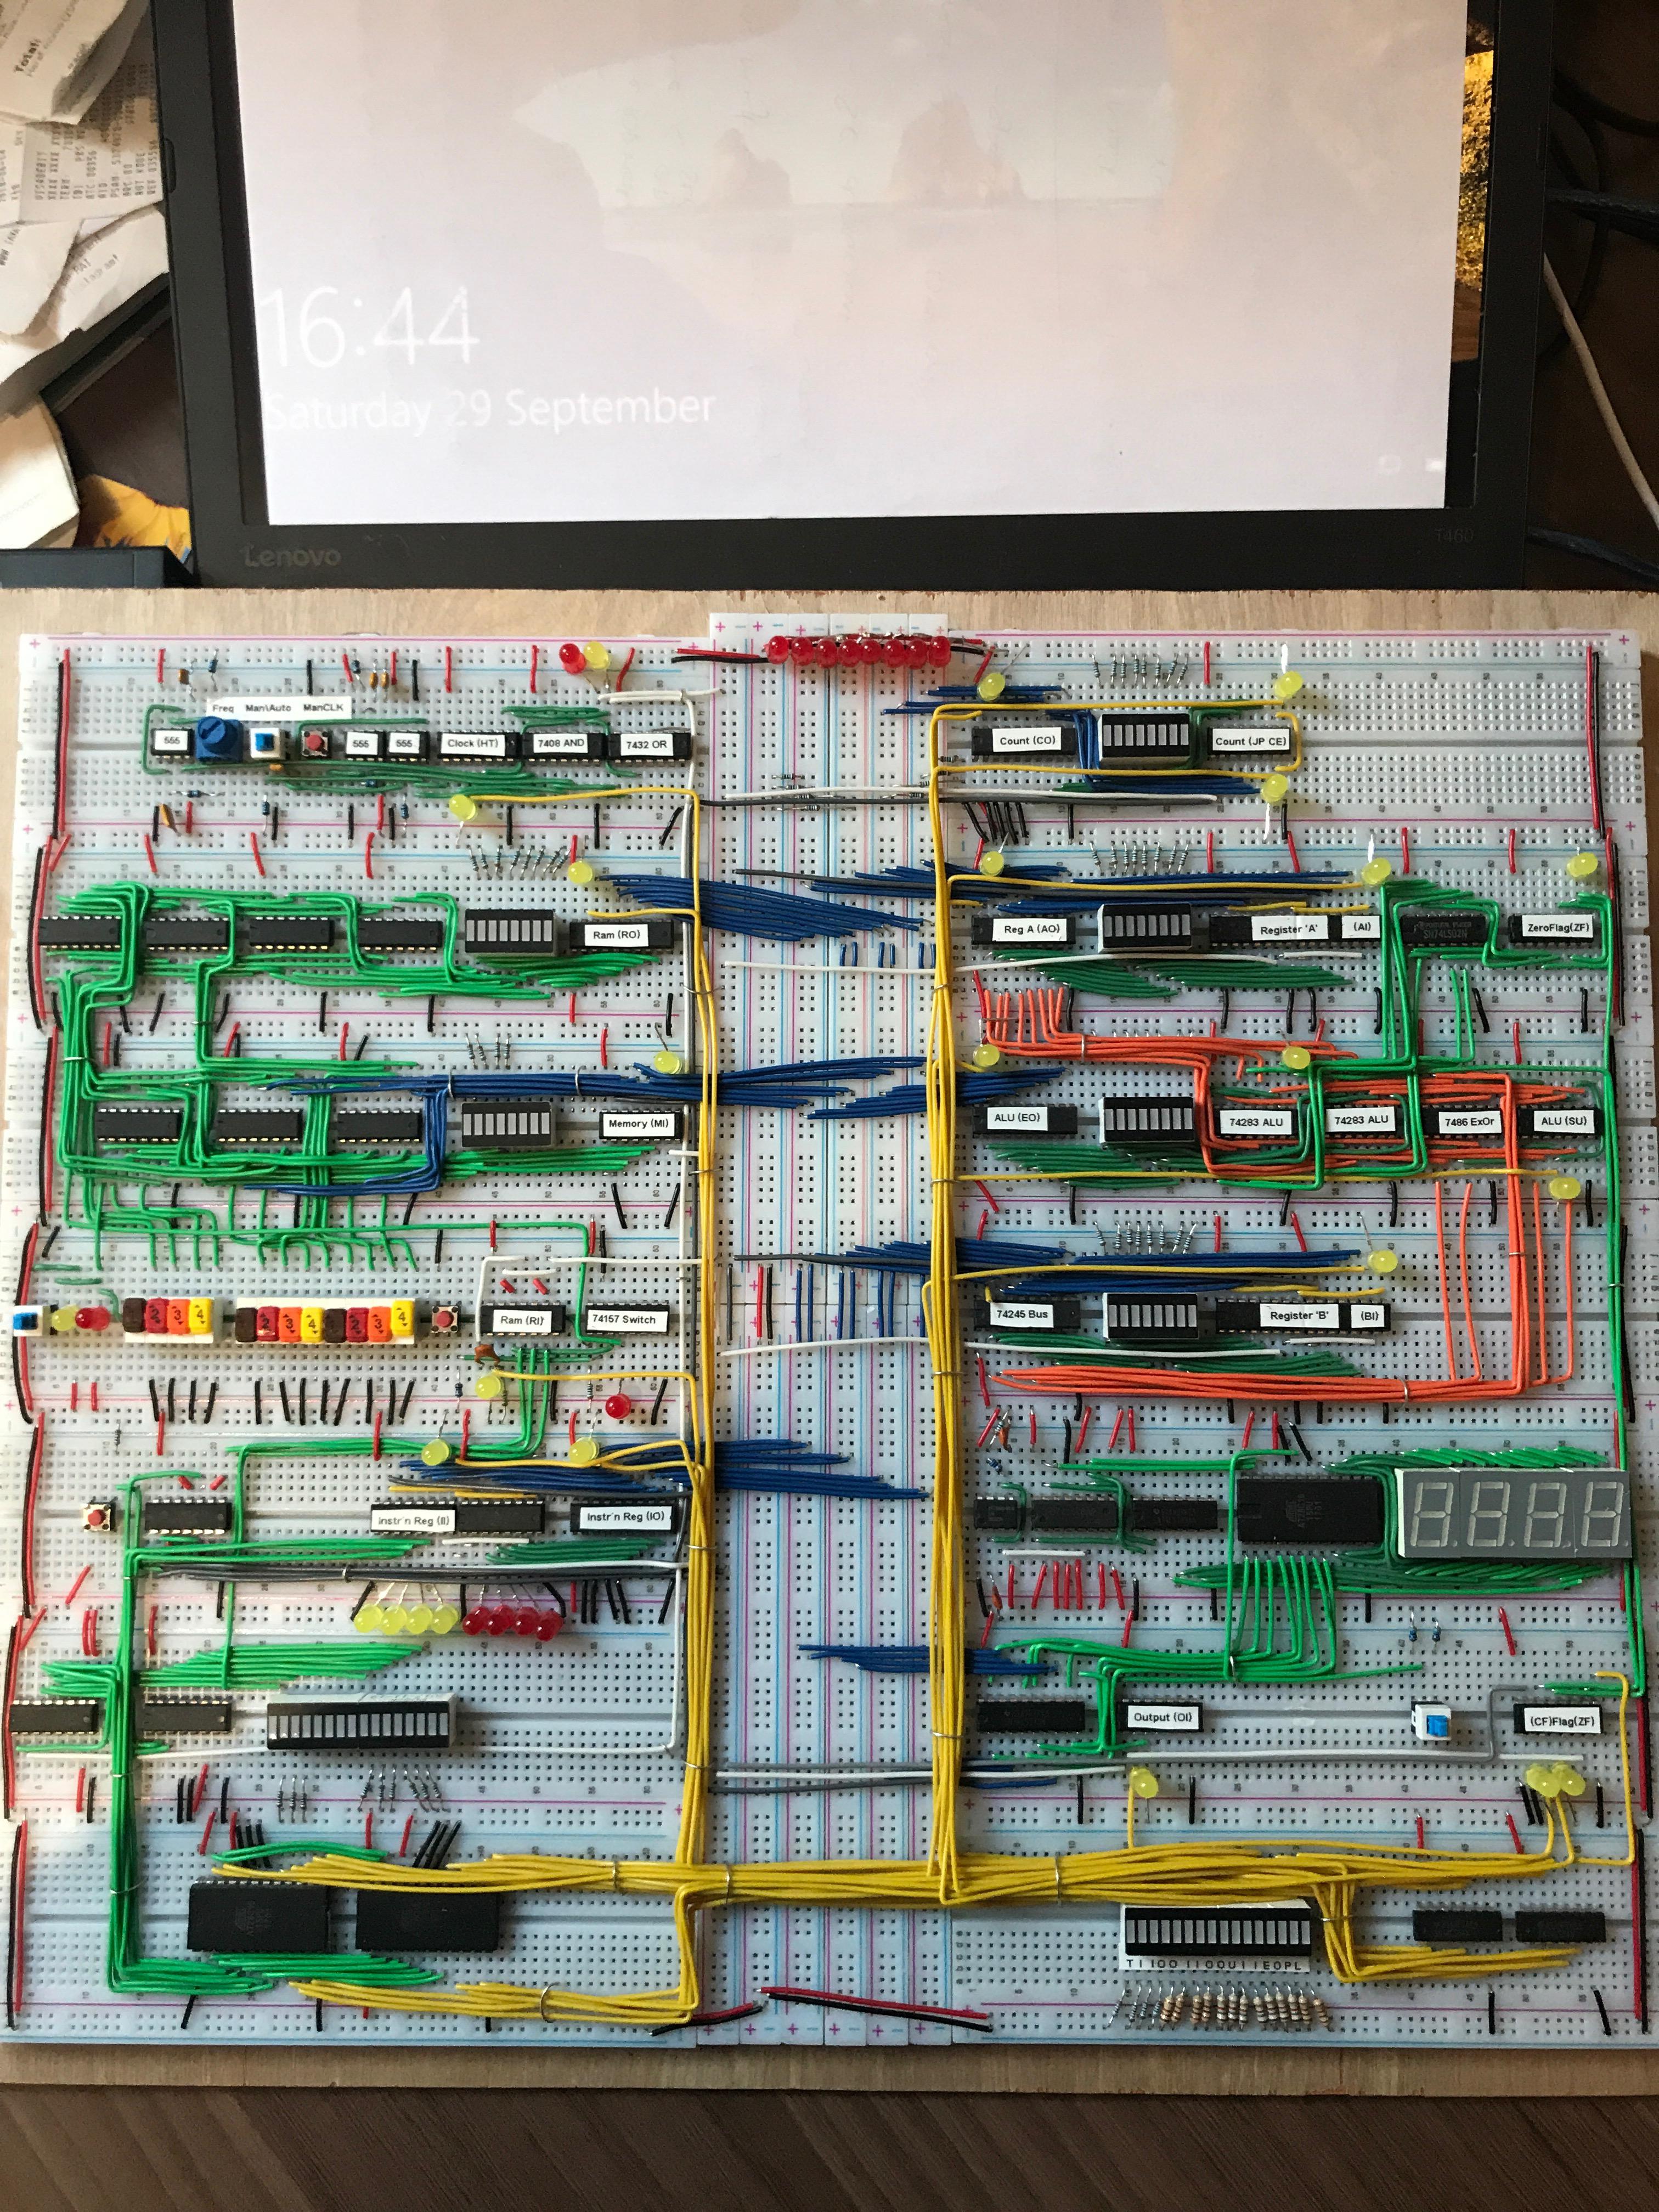 How to Build an 8-Bit Computer